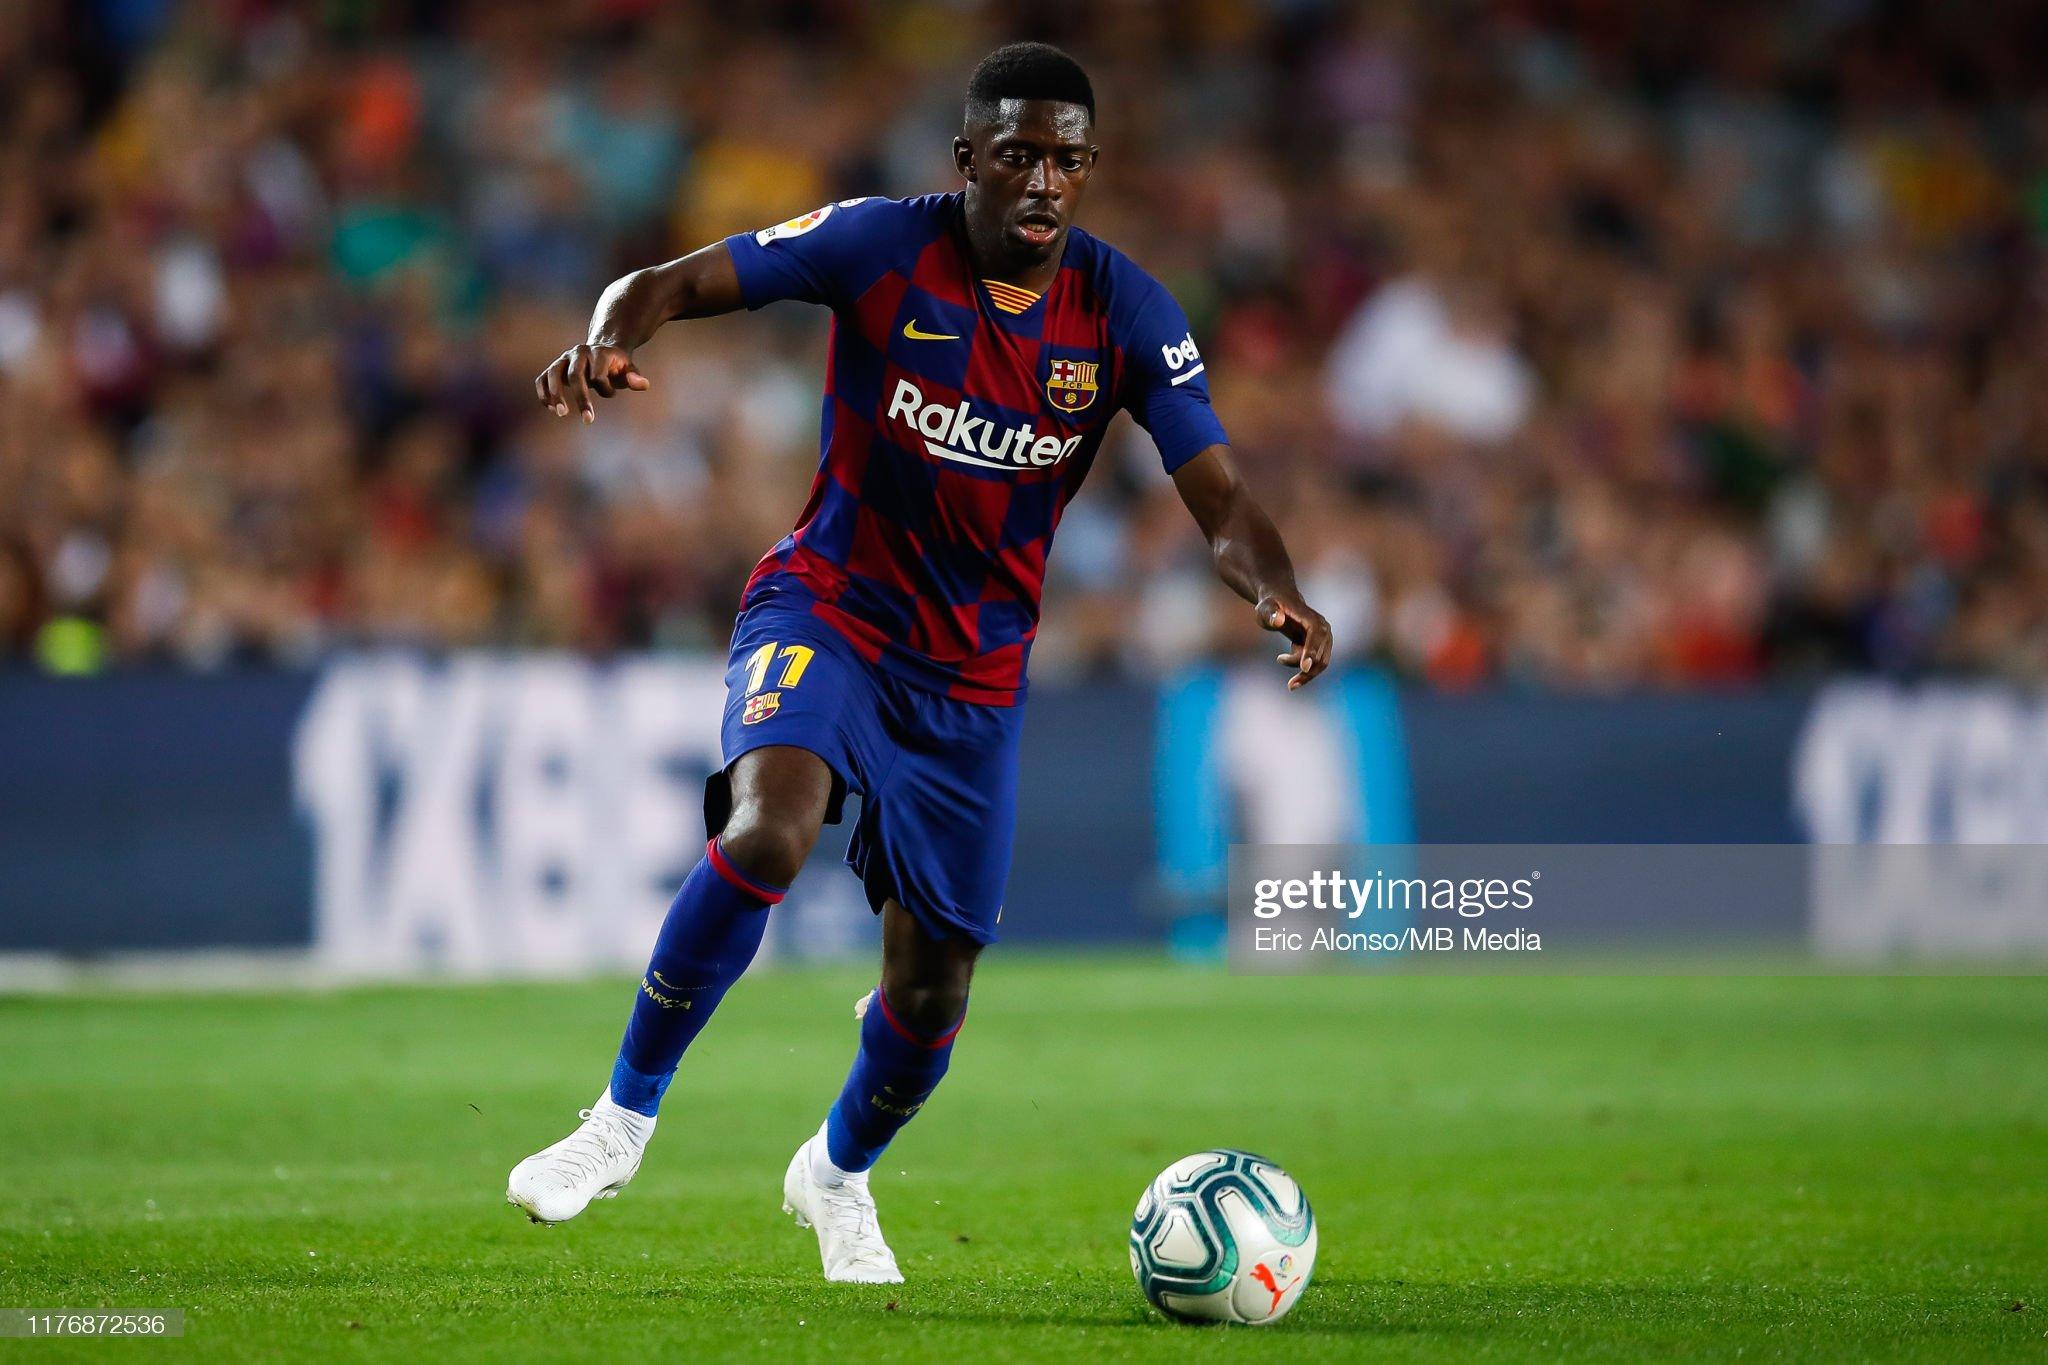 صور مباراة : برشلونة - فياريال 2-1 ( 24-09-2019 )  Ousmane-demebele-of-fc-barcelona-controls-the-ball-during-the-liga-picture-id1176872536?s=2048x2048